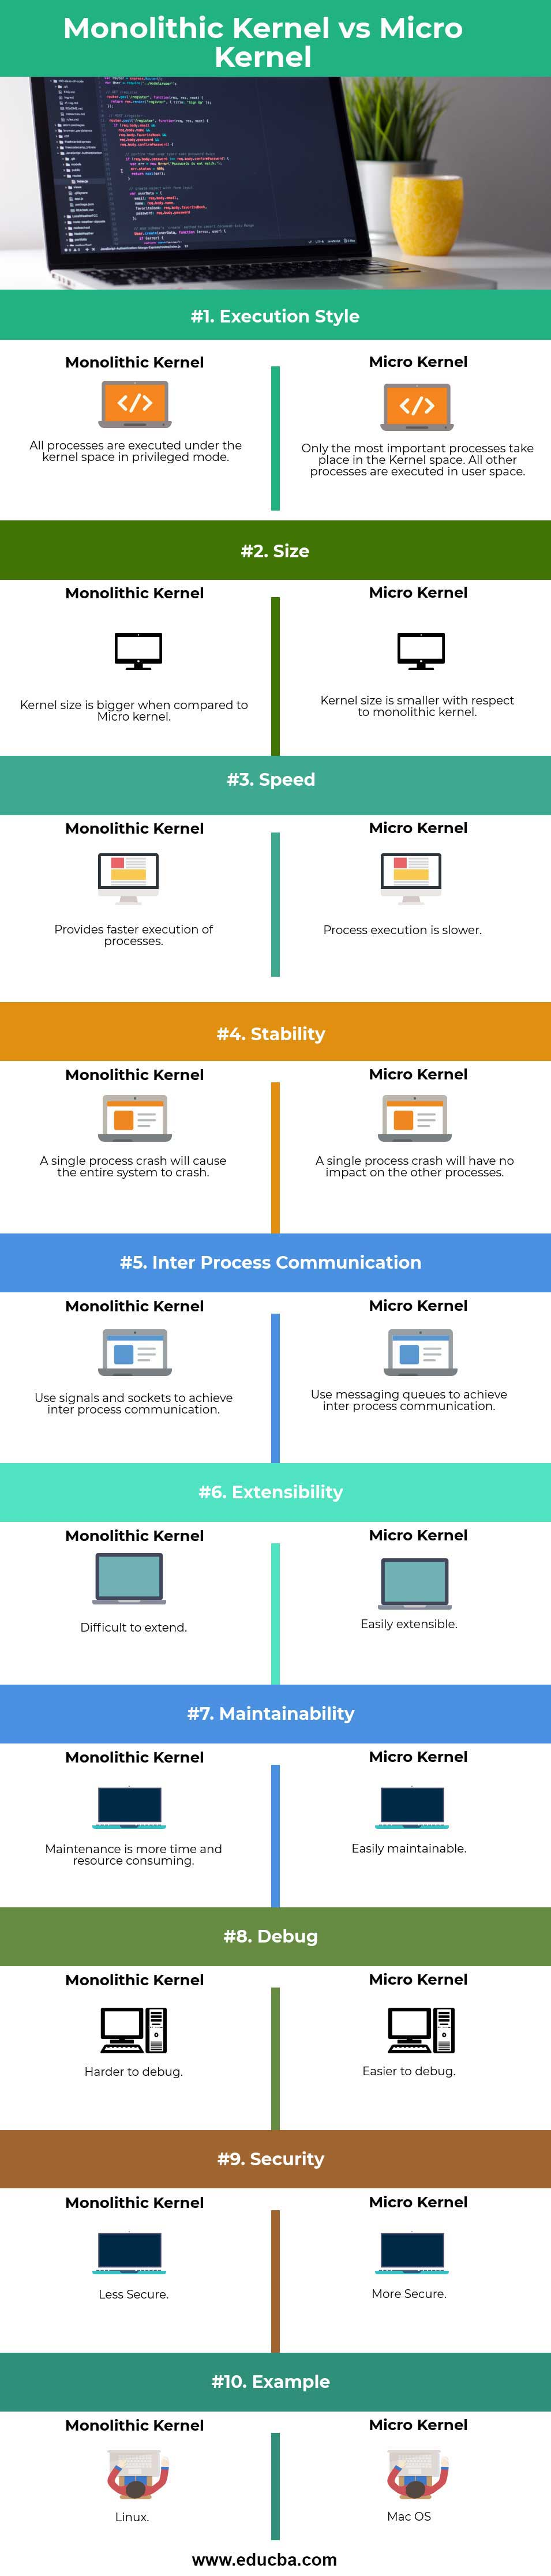 Monolithic Kernel vs Micro Kernel info